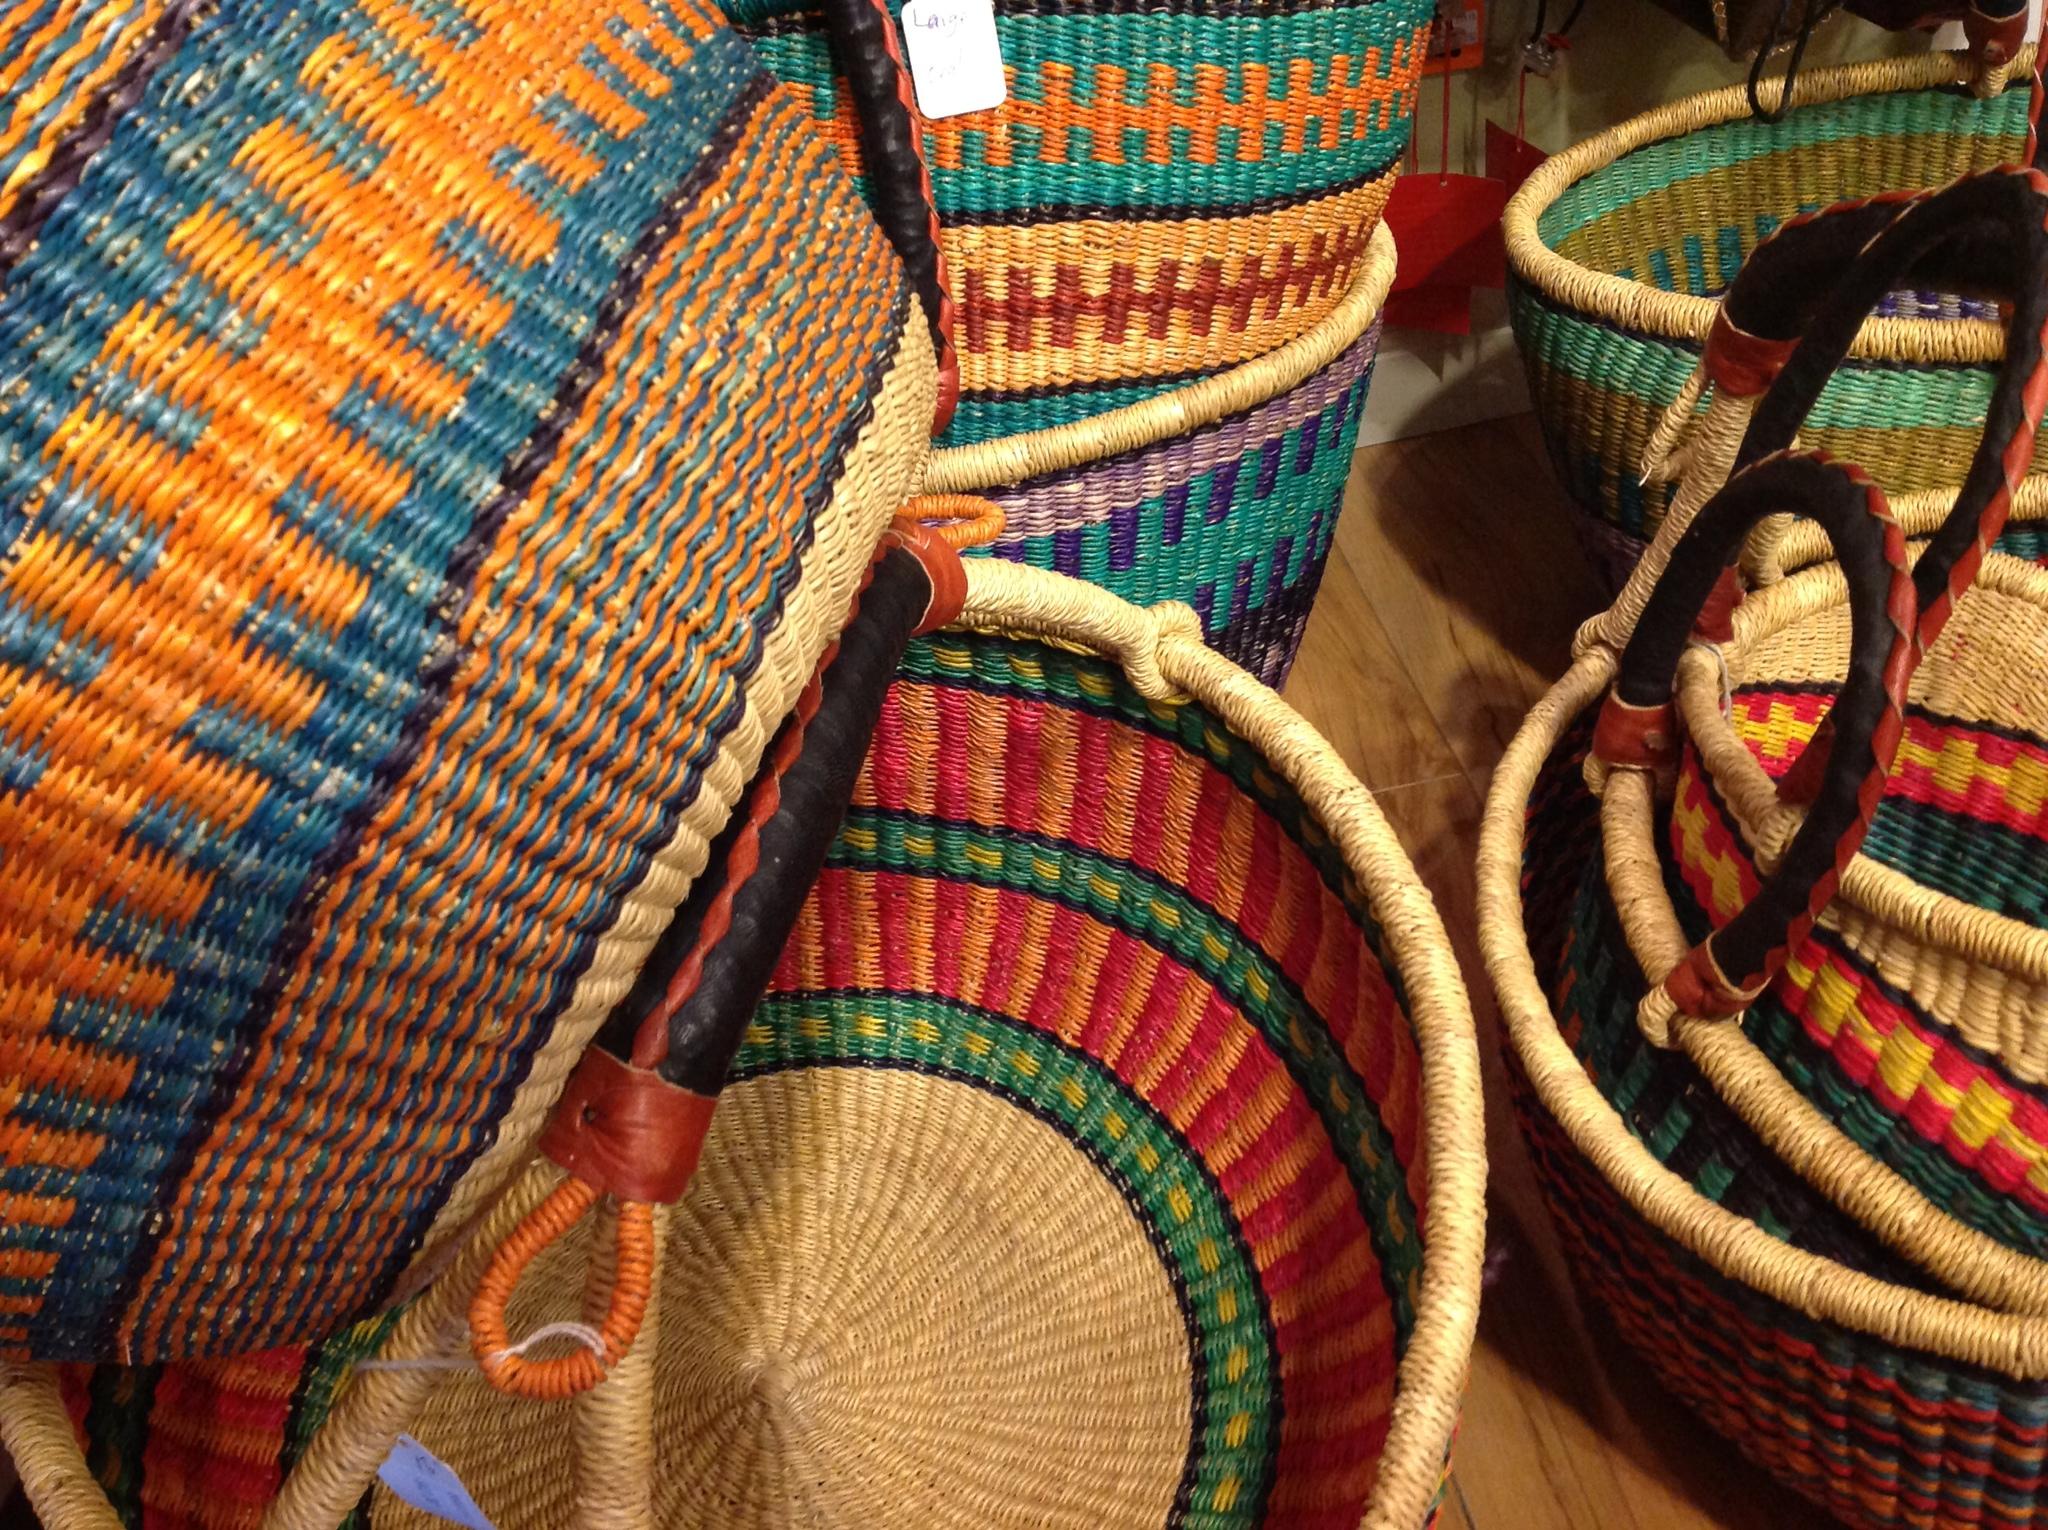 Fair Trade African Baskets Three Bags Full Yarn Store